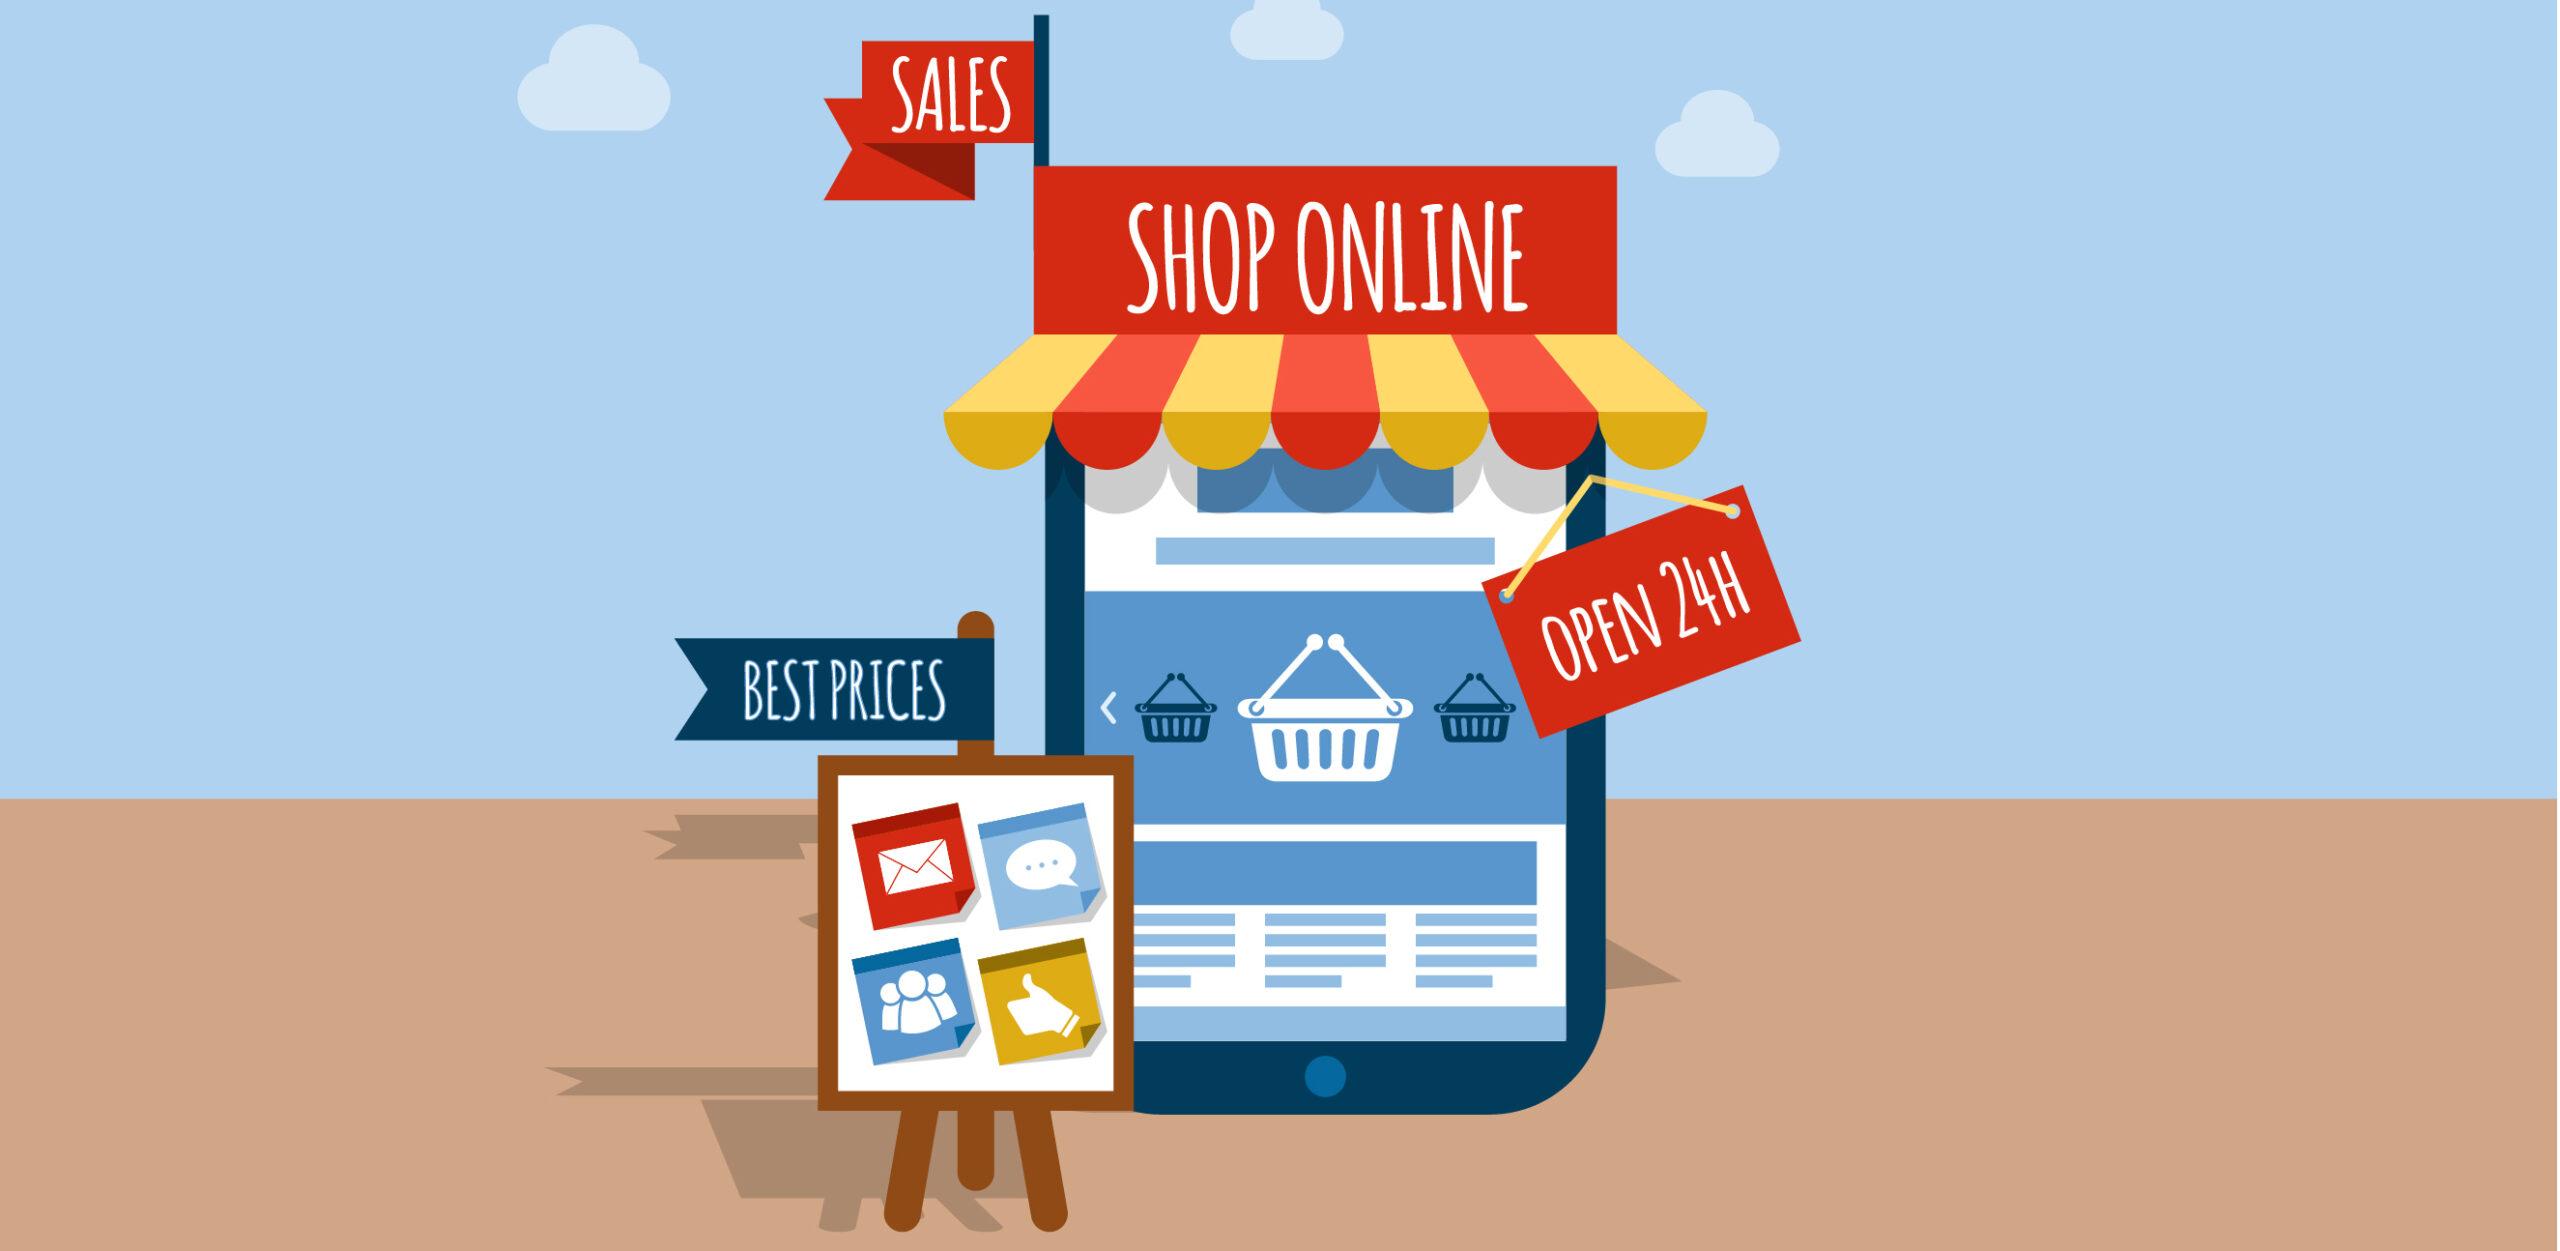 tienda online requisitos legales